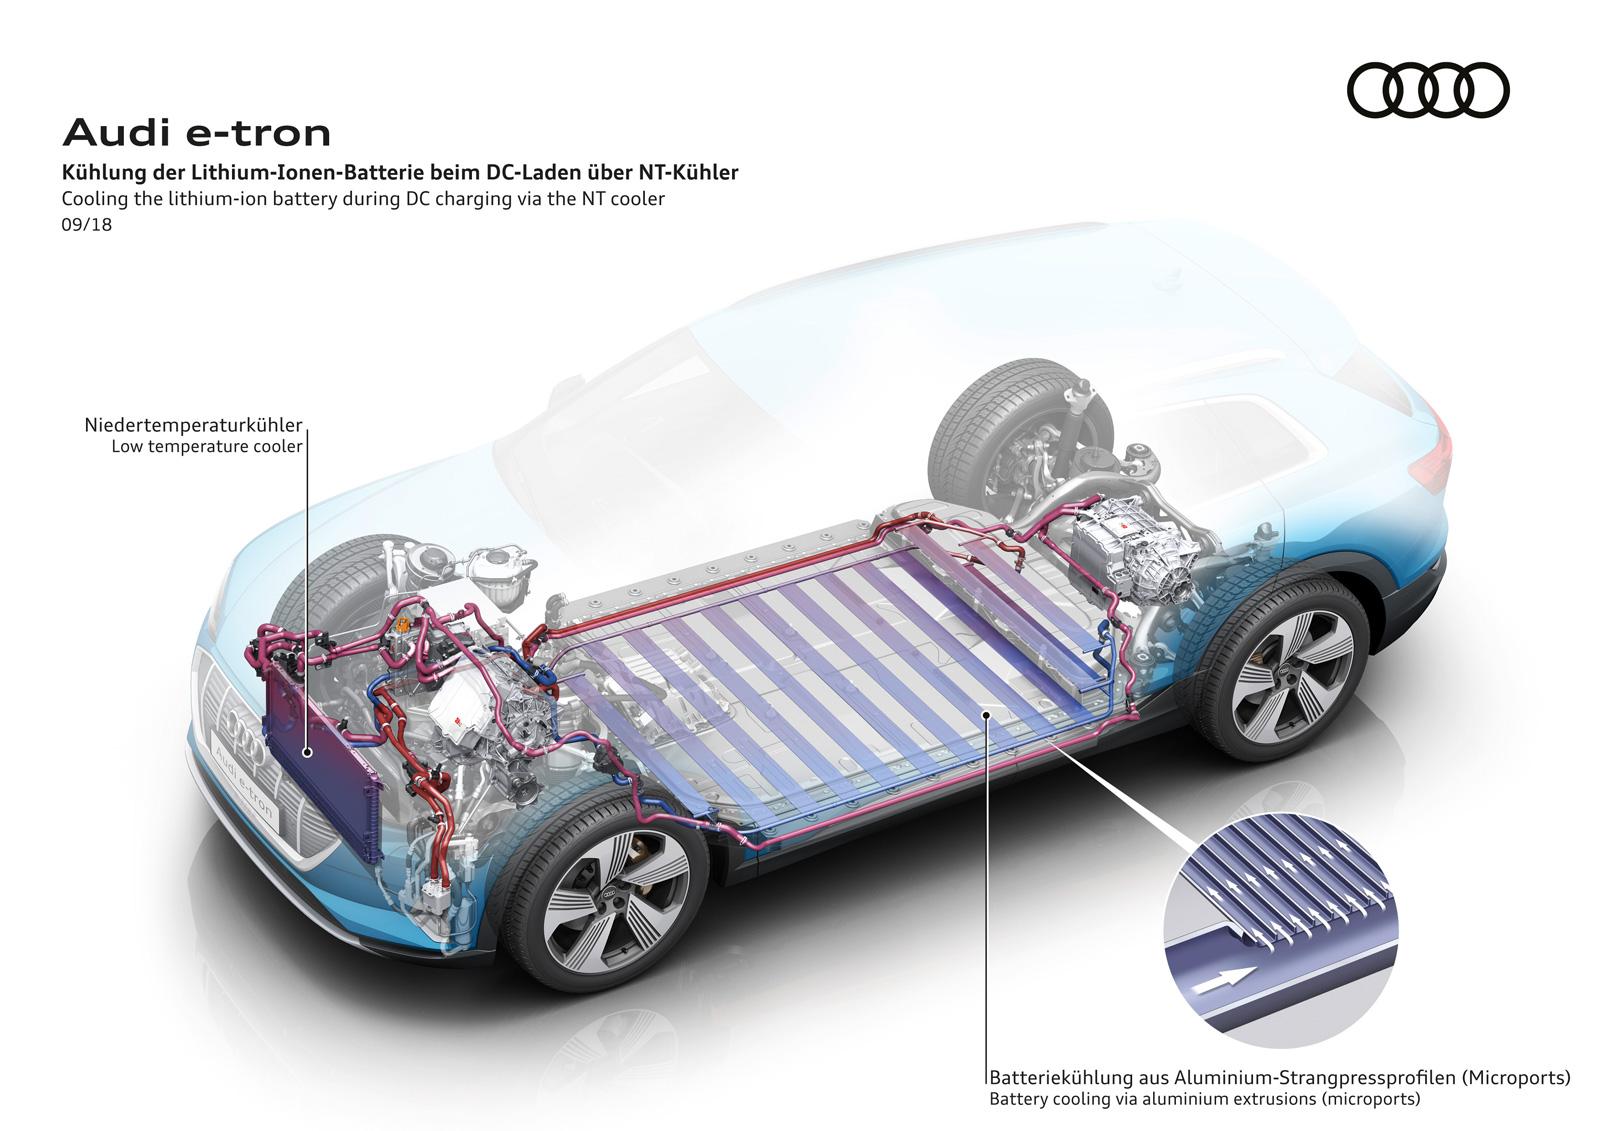 Audi-e-tron-Ladeleistung-Vergleich-2